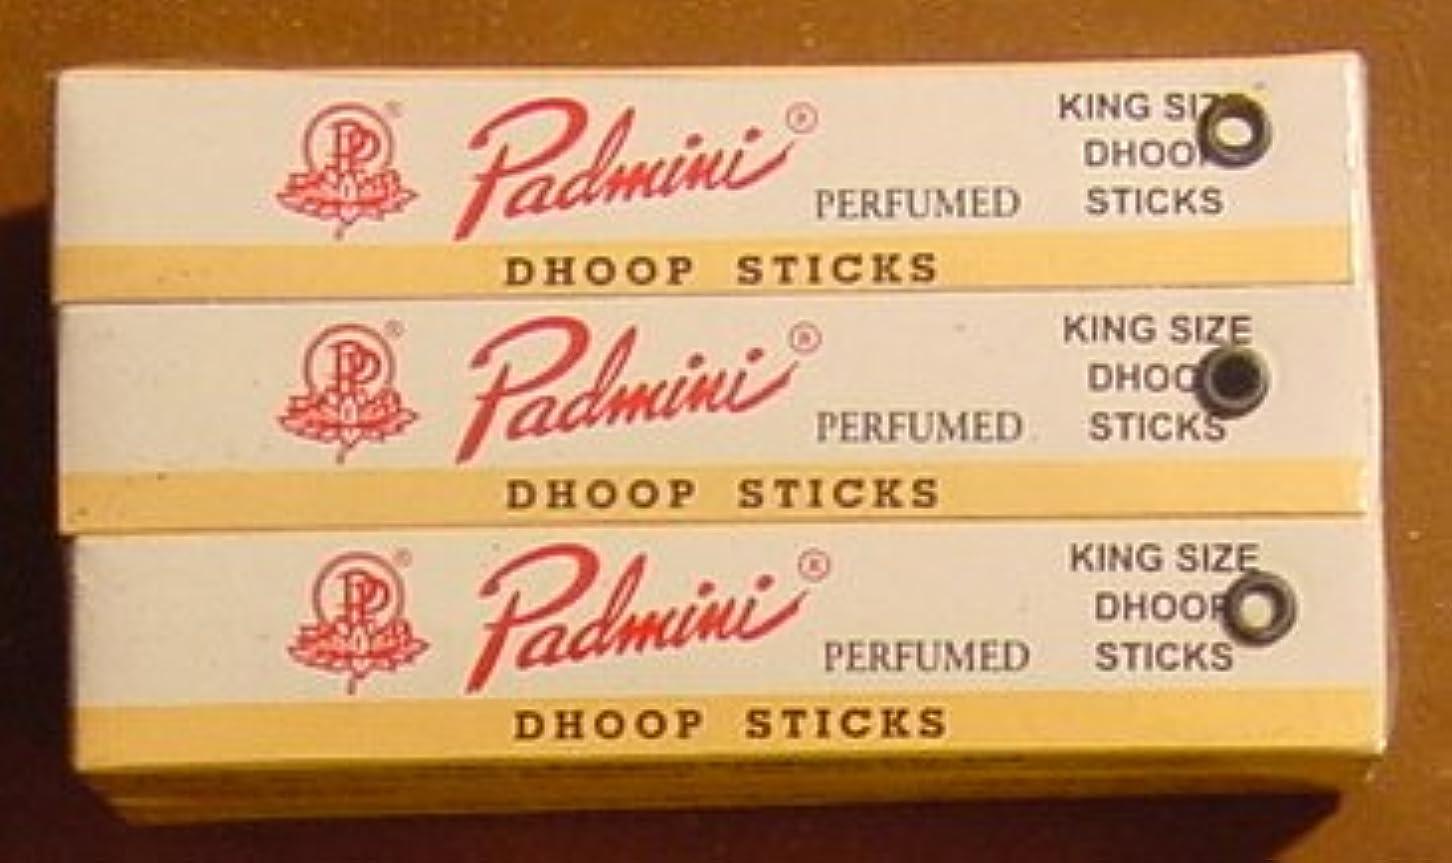 Padmini Dhoop Sticks – 12ボックスの10 Sticks各 – 5